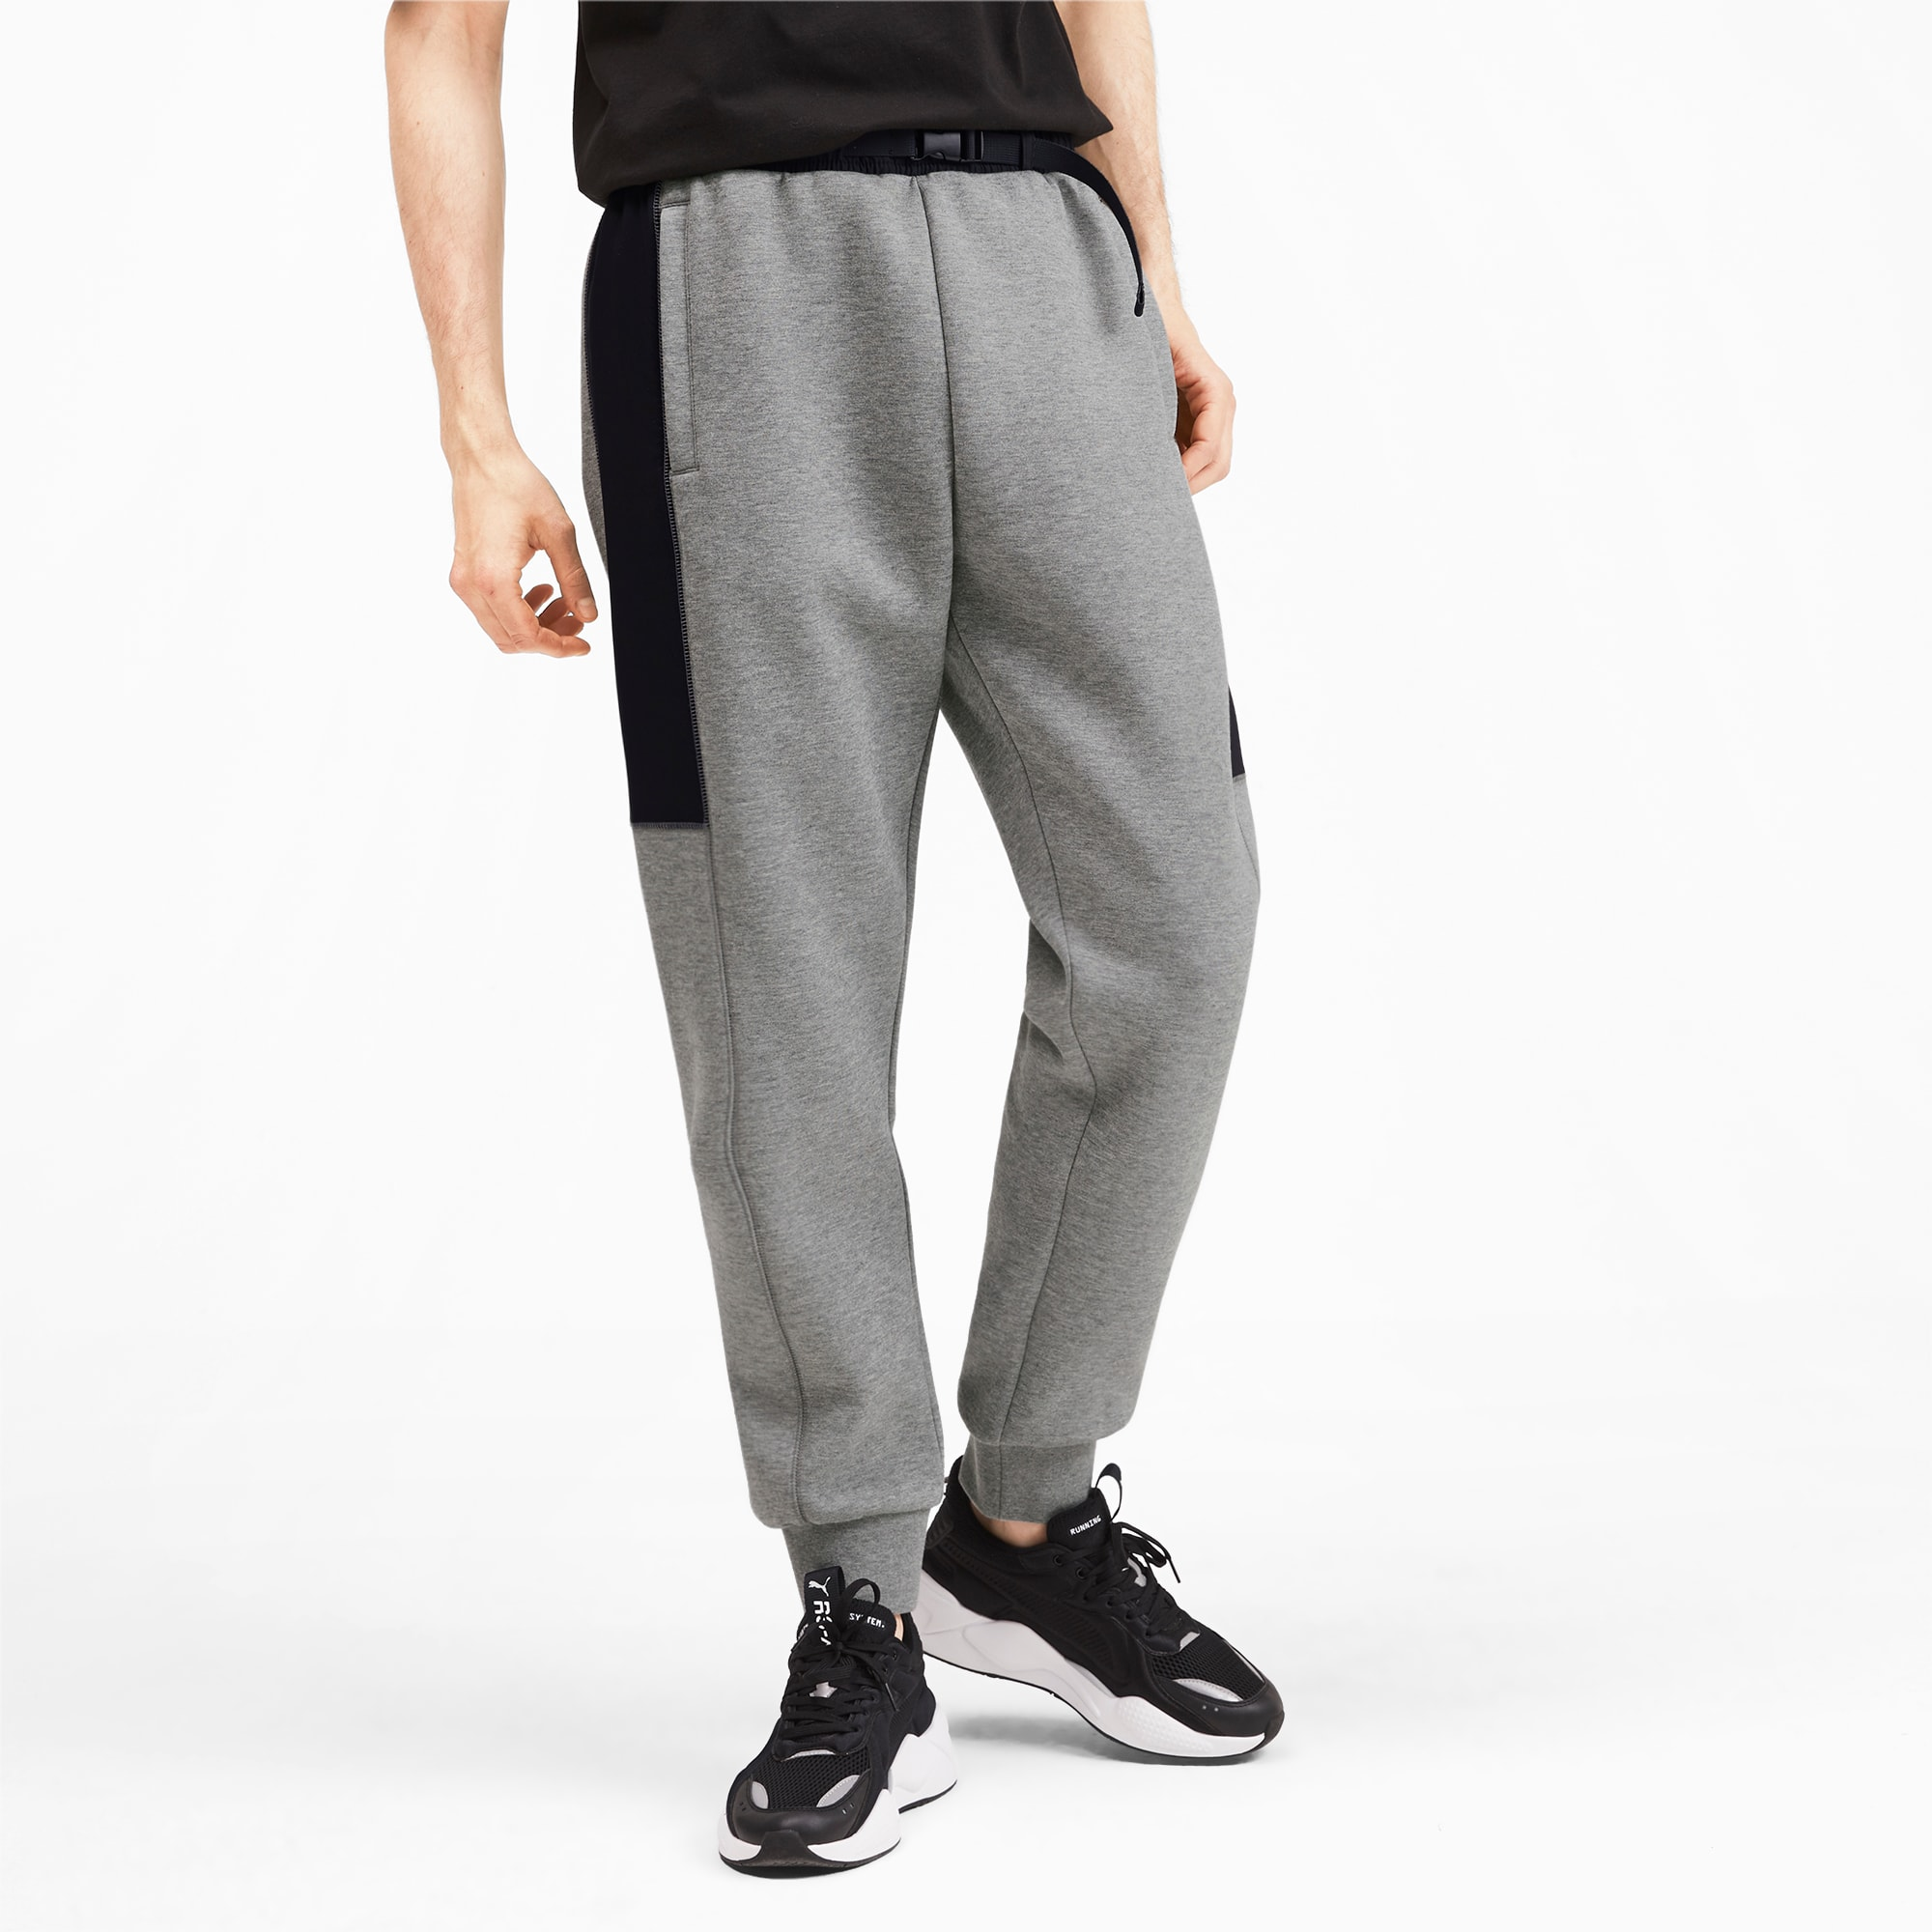 Pantalones de Chándal de Hombre Epoch Hybrid, Gris, Talla M | PUMA Hombres